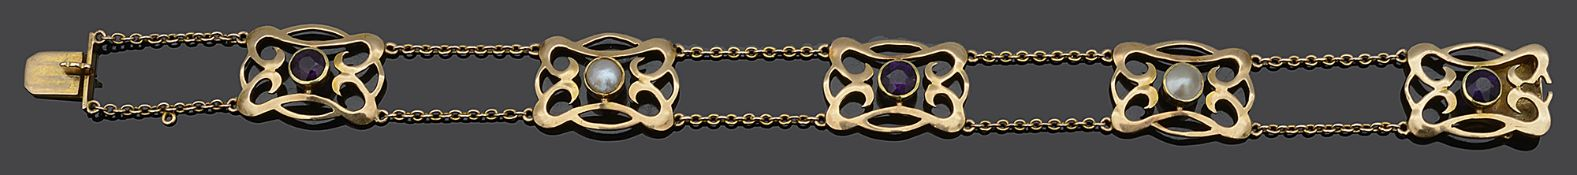 An Art Nouveau amethyst and blister pearl scroll panel bracelet